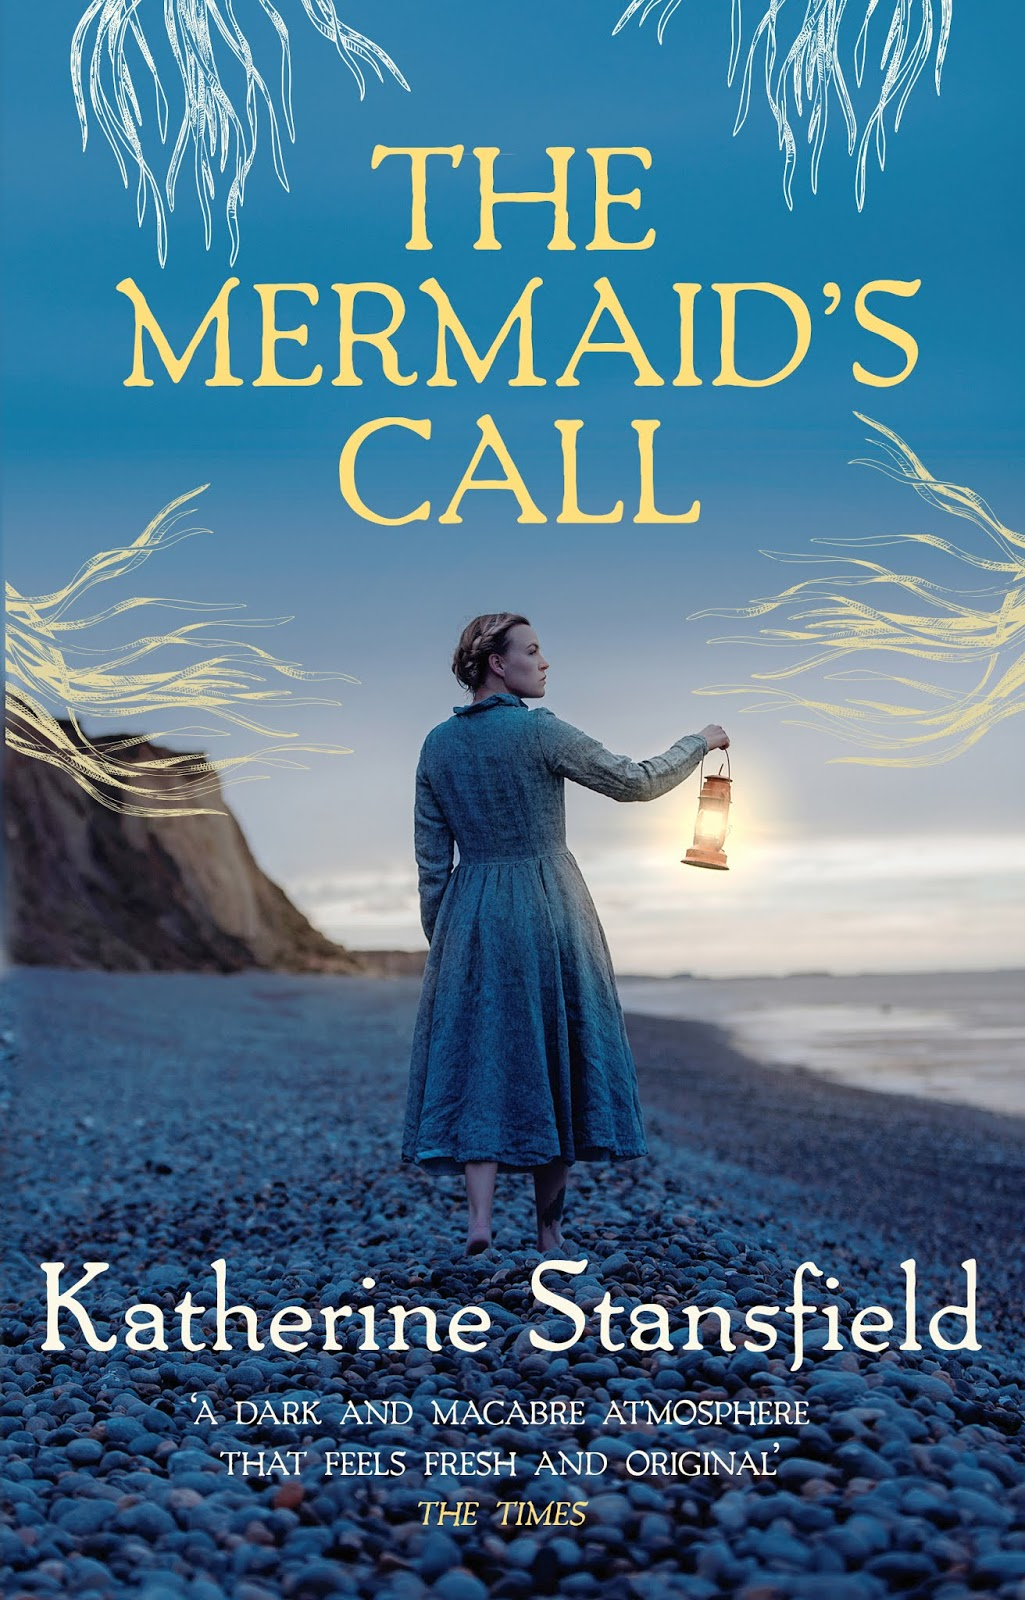 Katherine Stansfield: Fiction - Cornish Mysteries